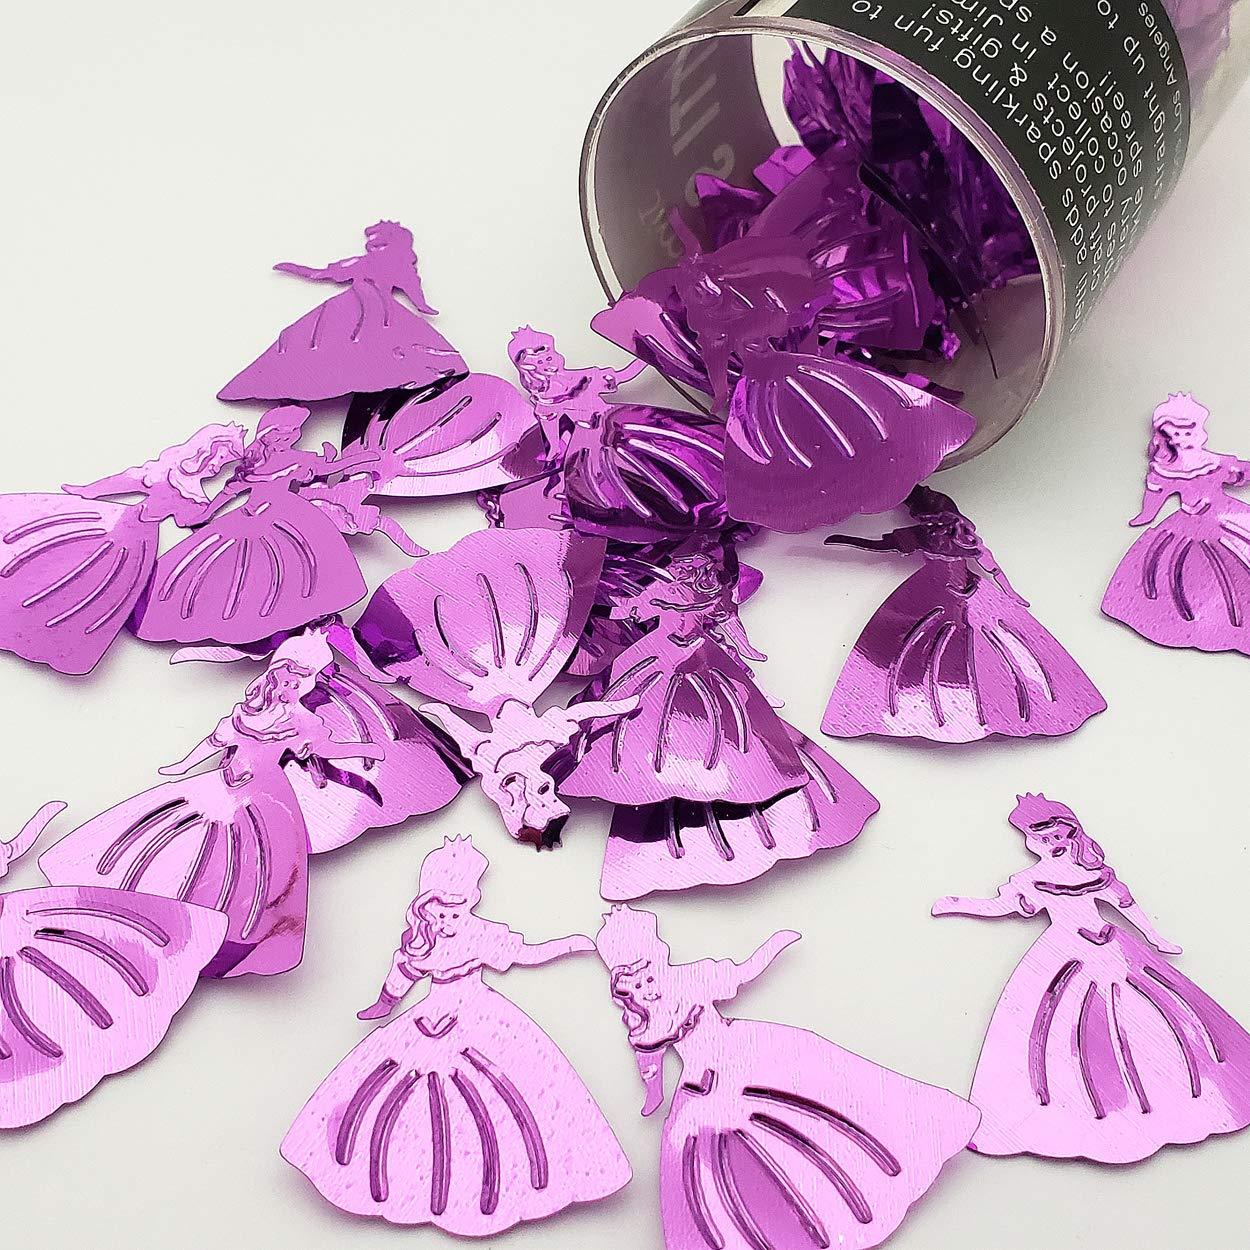 Confetti Princess Pink - One Pound (16 oz) Free Priority Mail (9215)